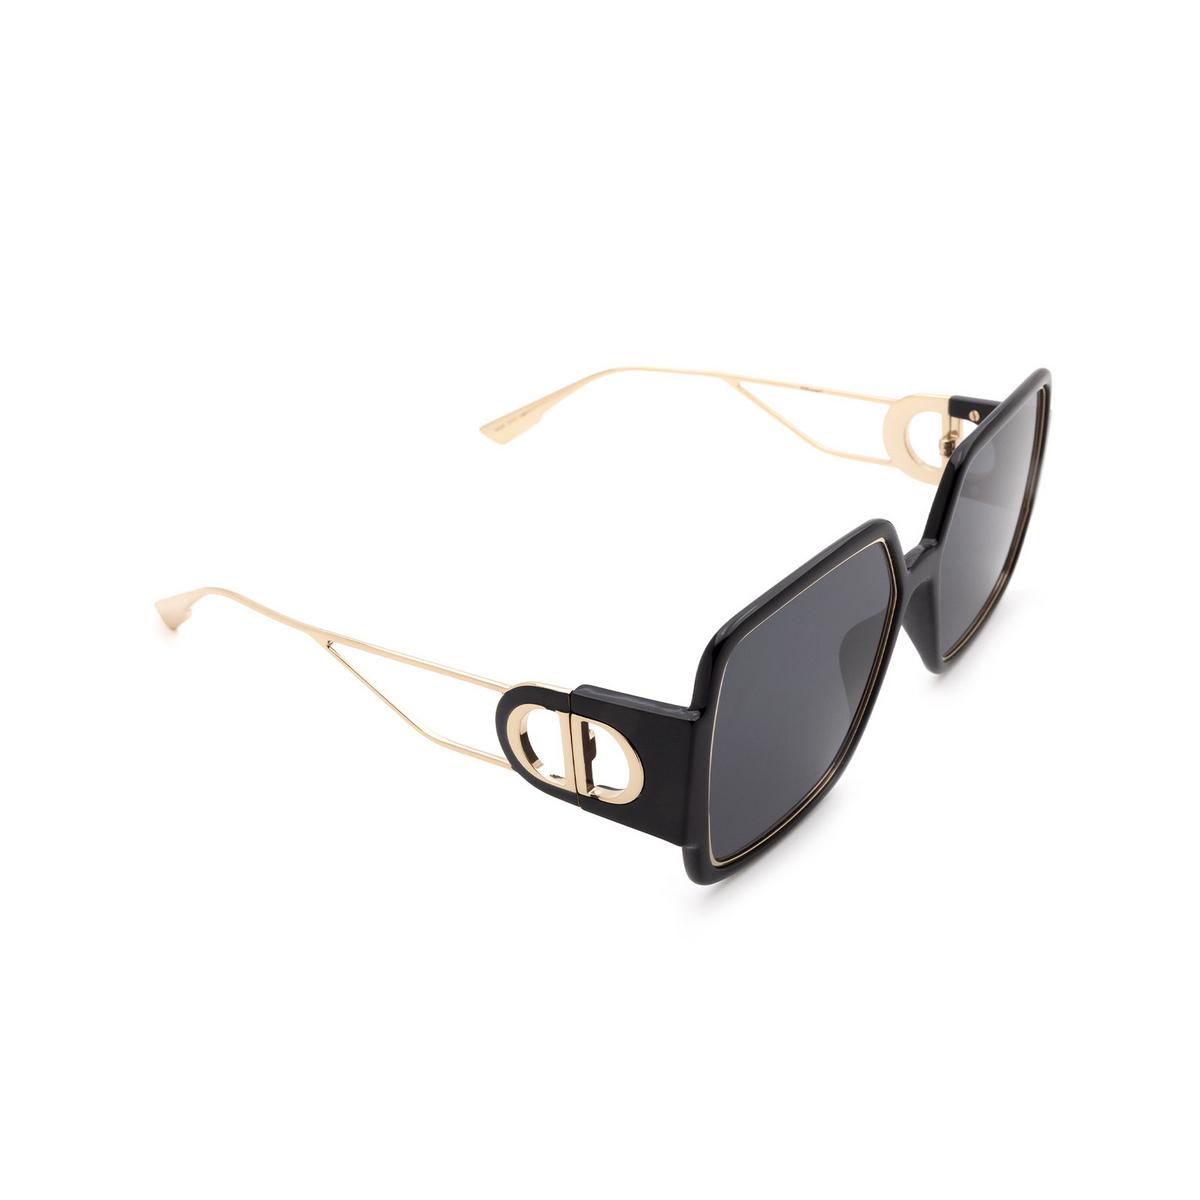 Dior® Square Sunglasses: 30MONTAIGNE2 color Black Gold 2M2/2K - three-quarters view.